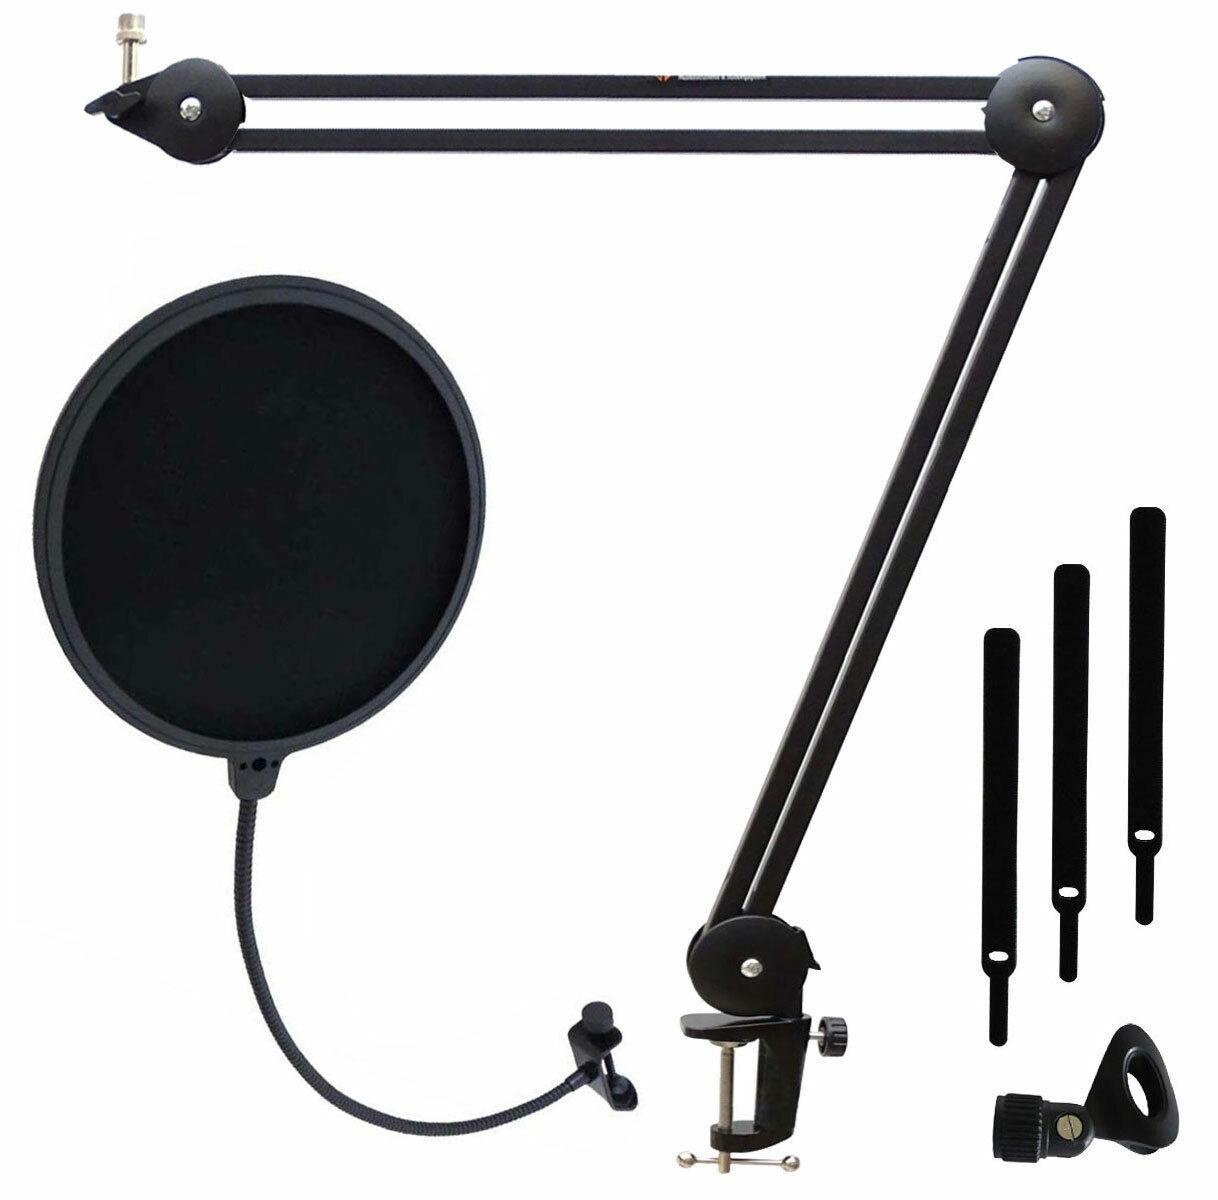 Keep DRUM MS138 mikrofonarm Tripod Articulated Arm + Popschutz POPFILTER